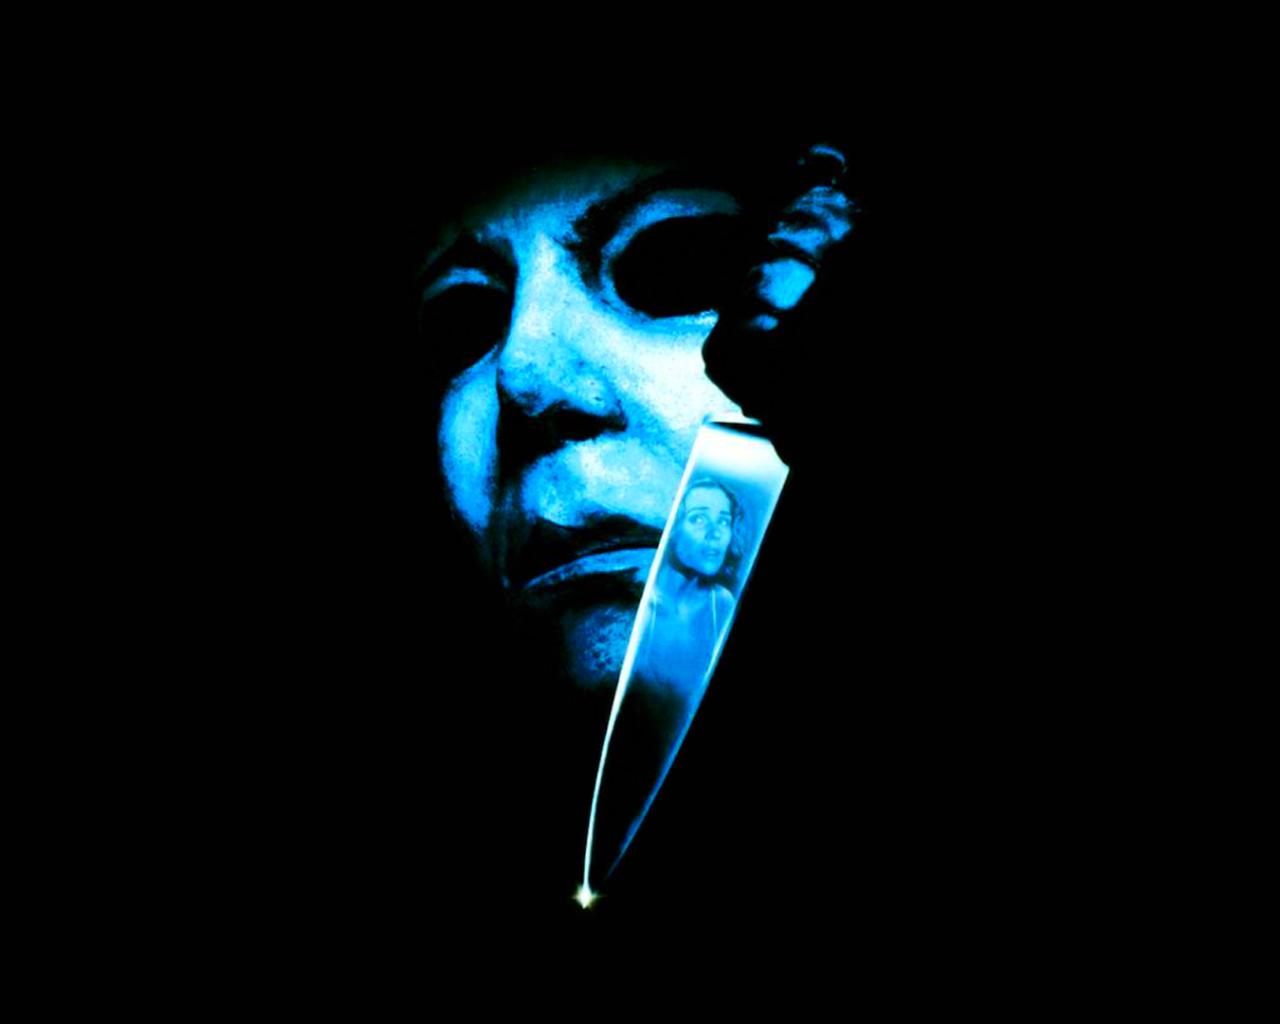 Michael Myers - Horror Movies Wallpaper (40828161) - Fanpop